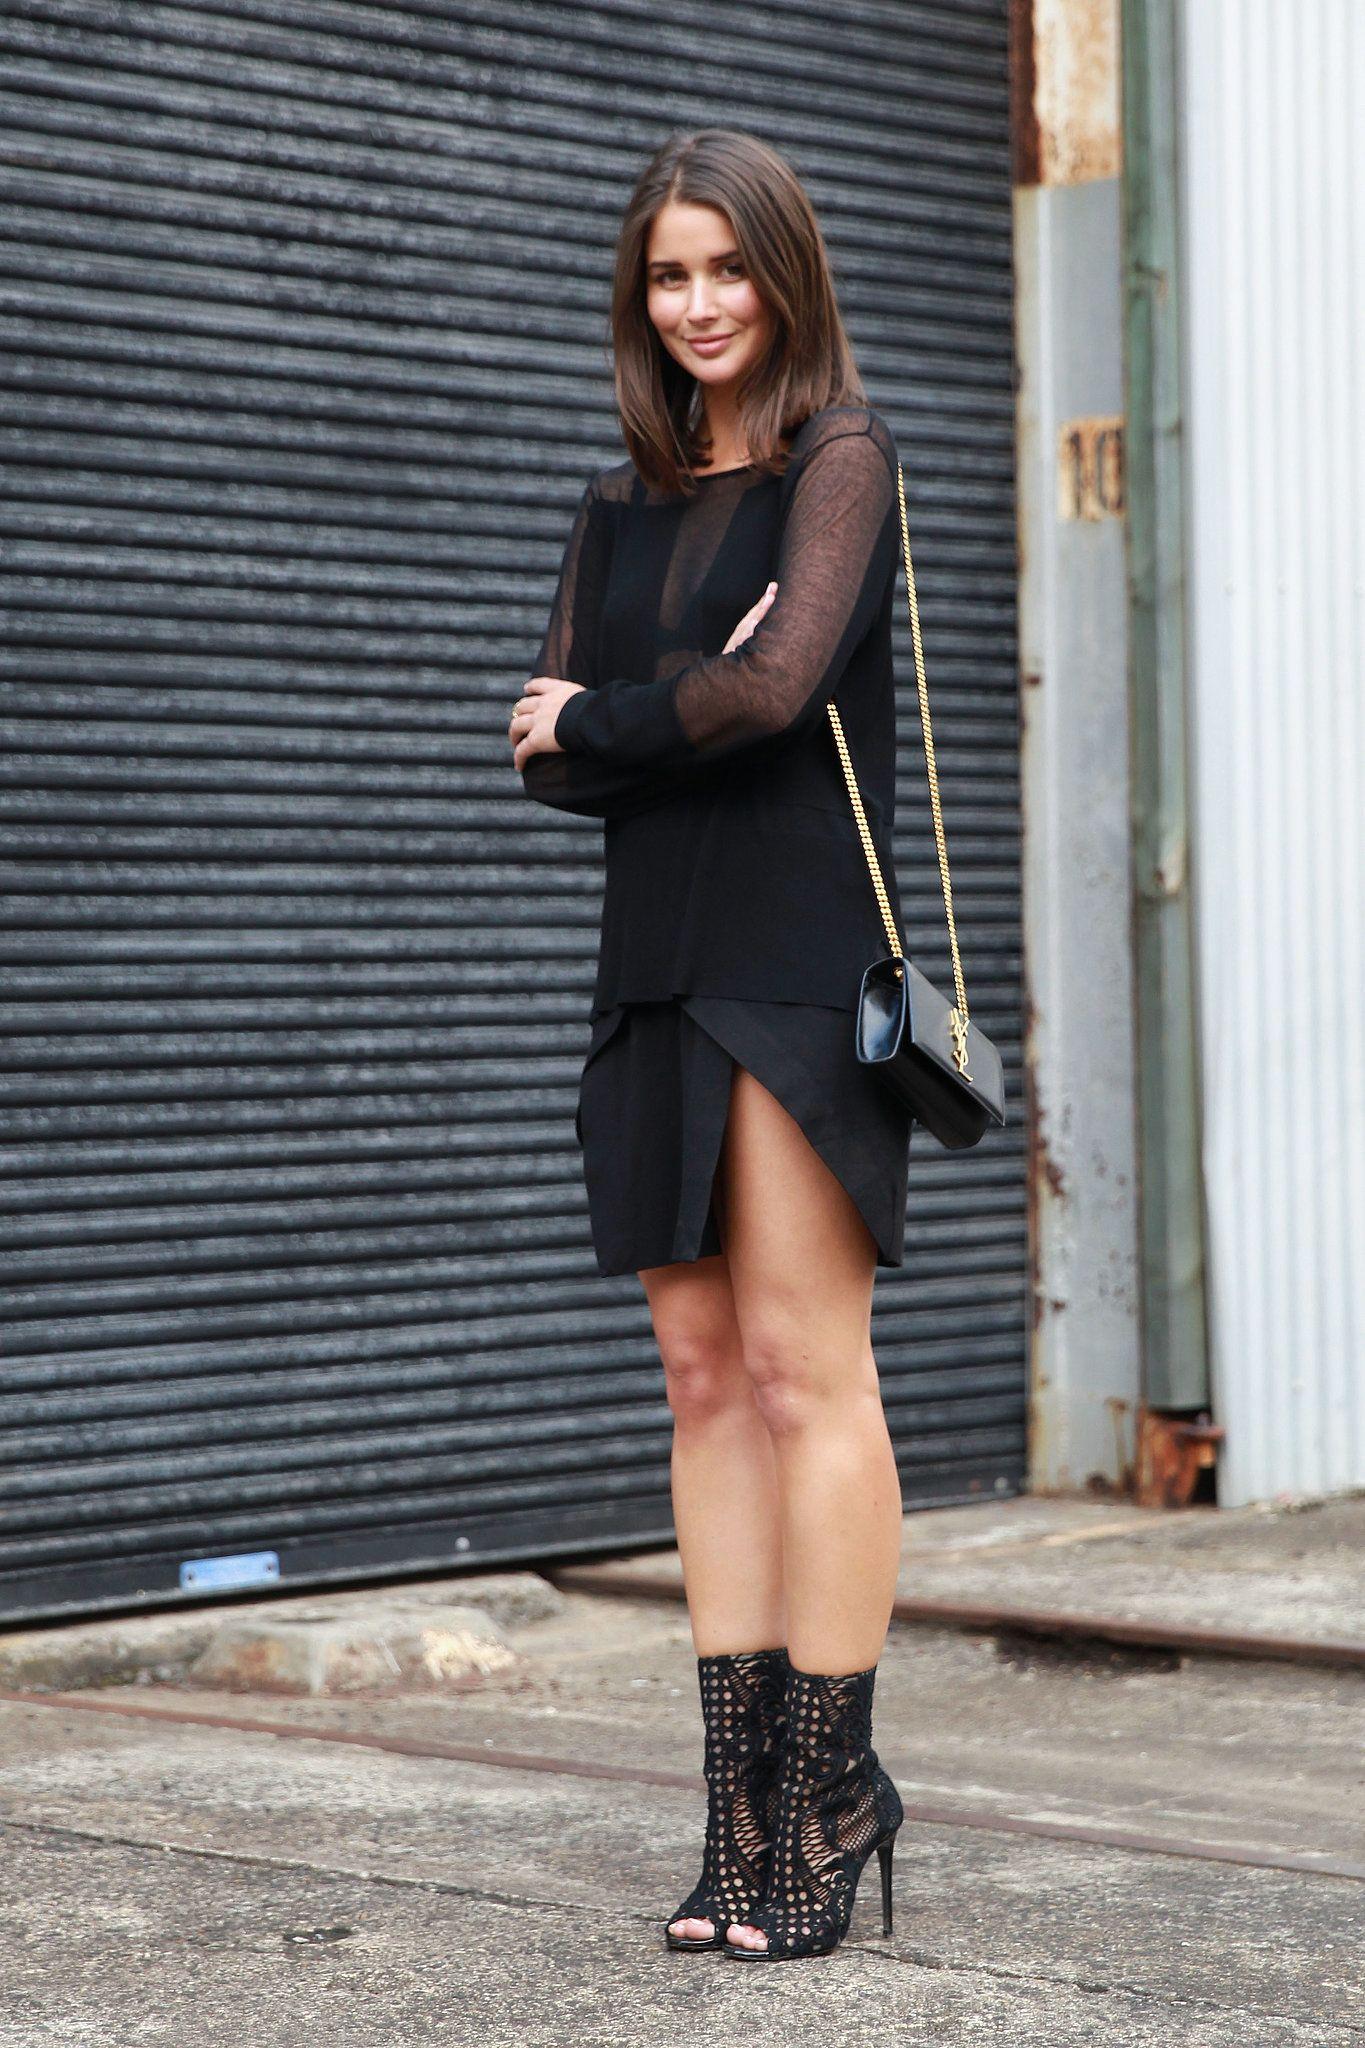 Sheer details, asymmetrical hemlines, and standout footwear. Sydney Fashion Week #StreetStyle